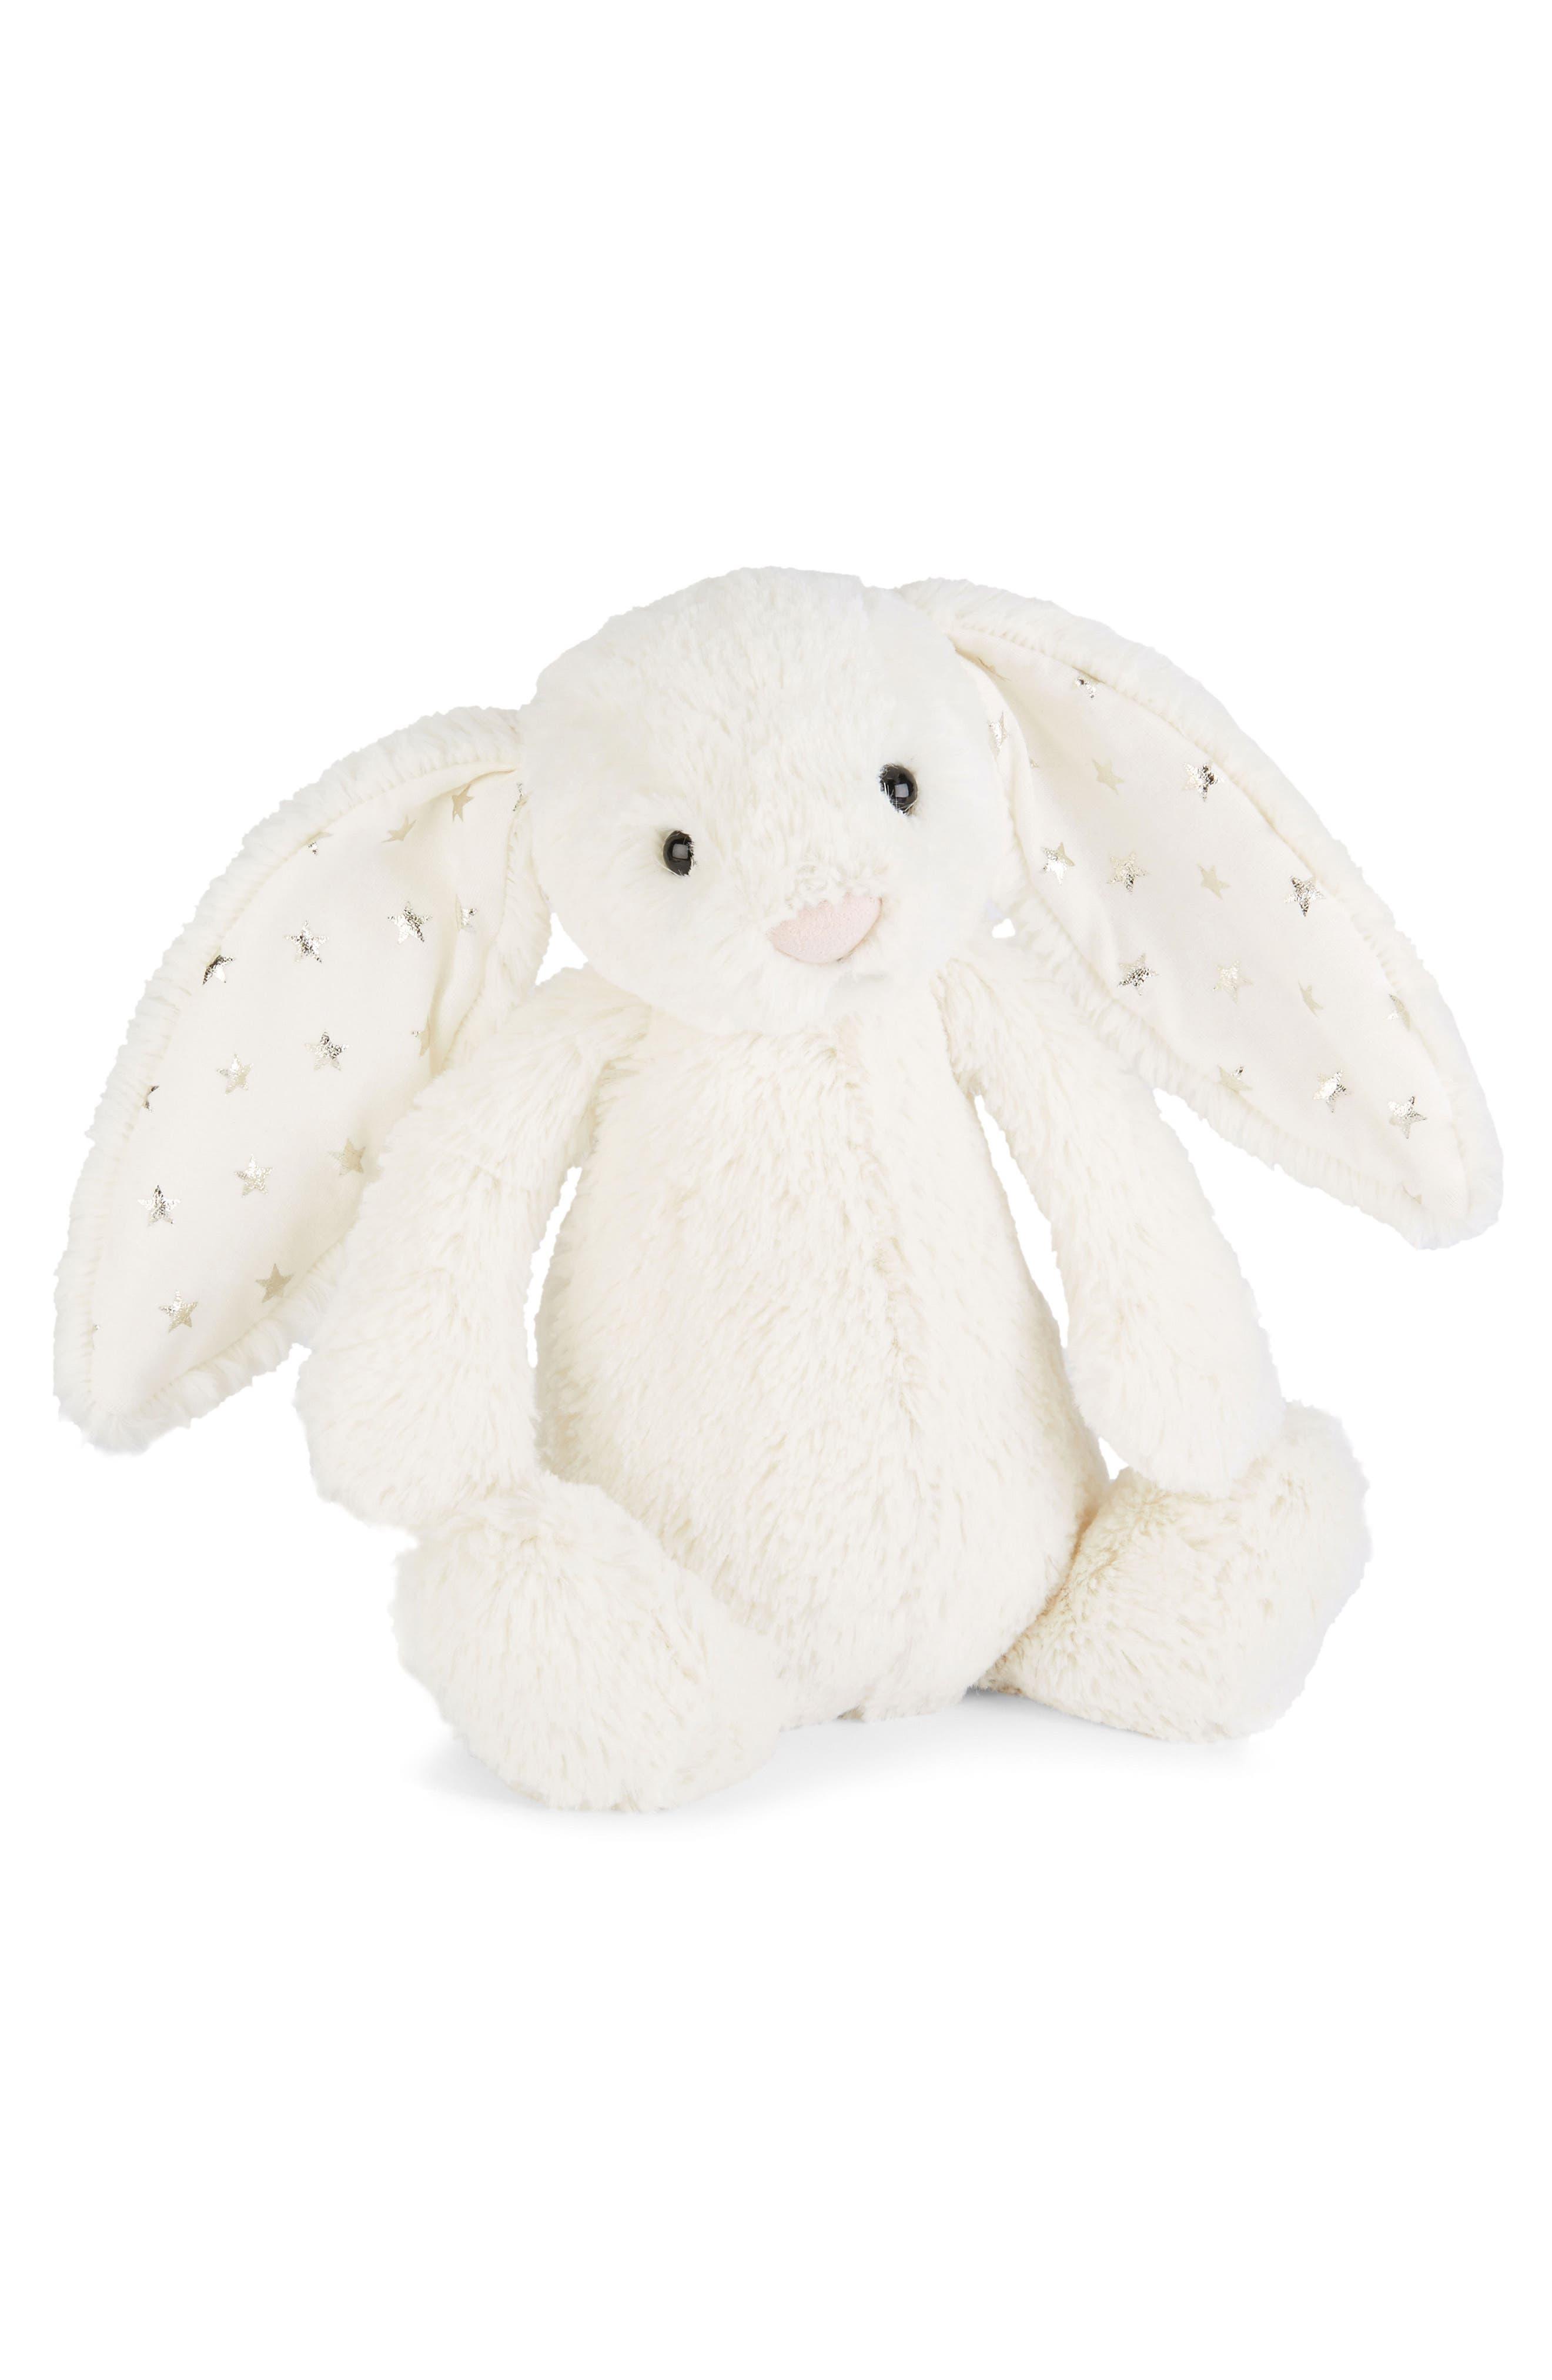 Twinkle Bunny Stuffed Animal,                             Main thumbnail 1, color,                             102